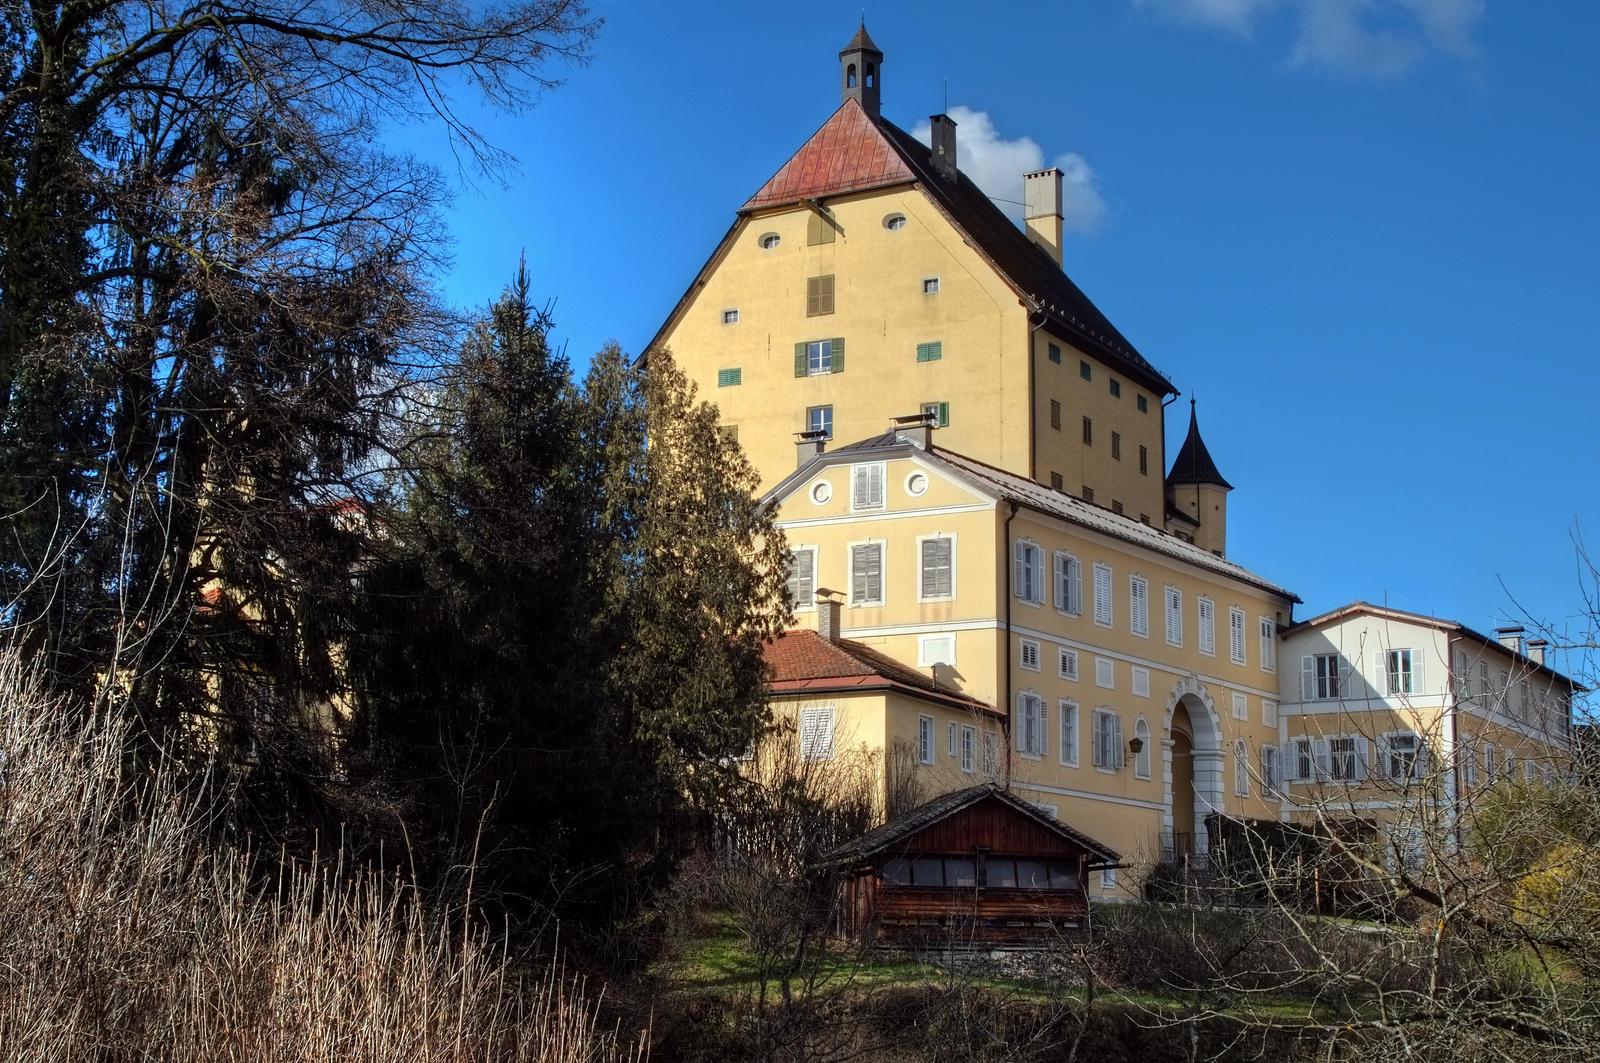 Castle Background by Burtn